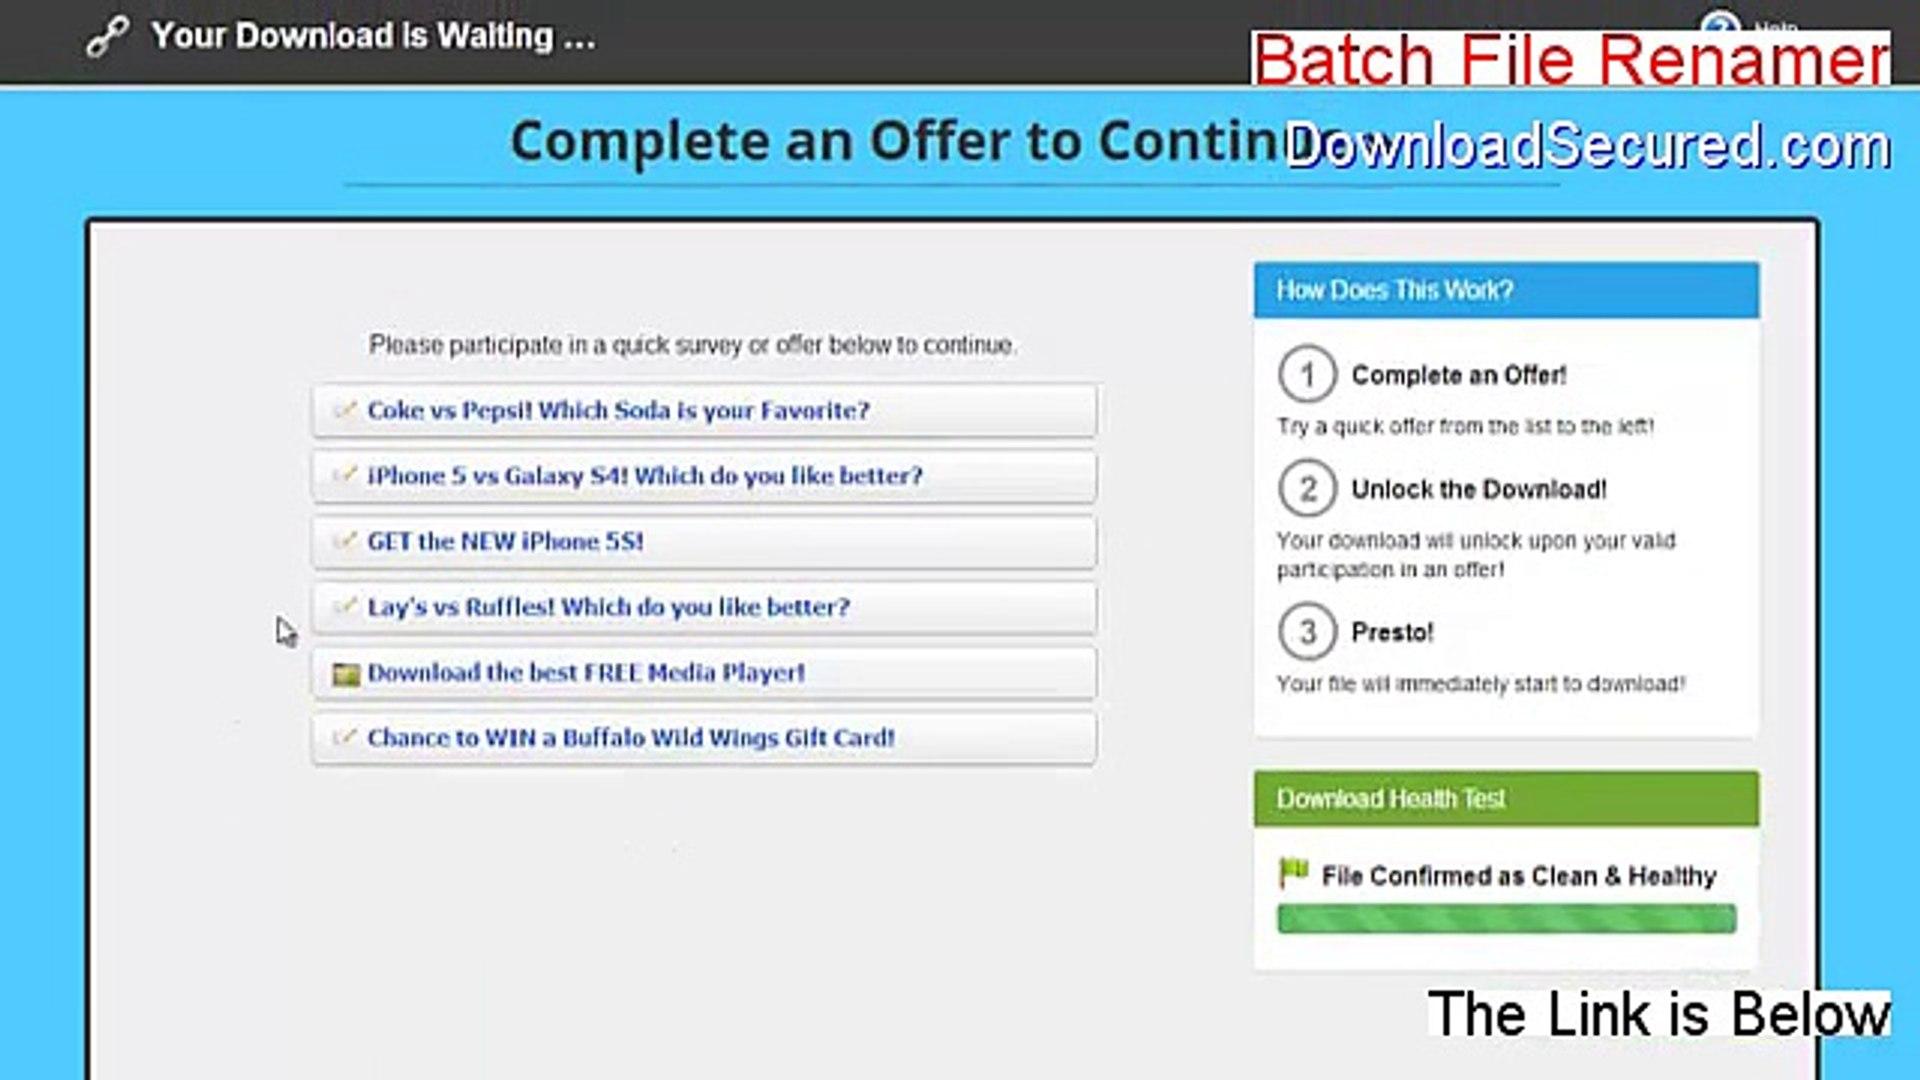 Batch File Renamer Keygen - Risk Free Download (2015)